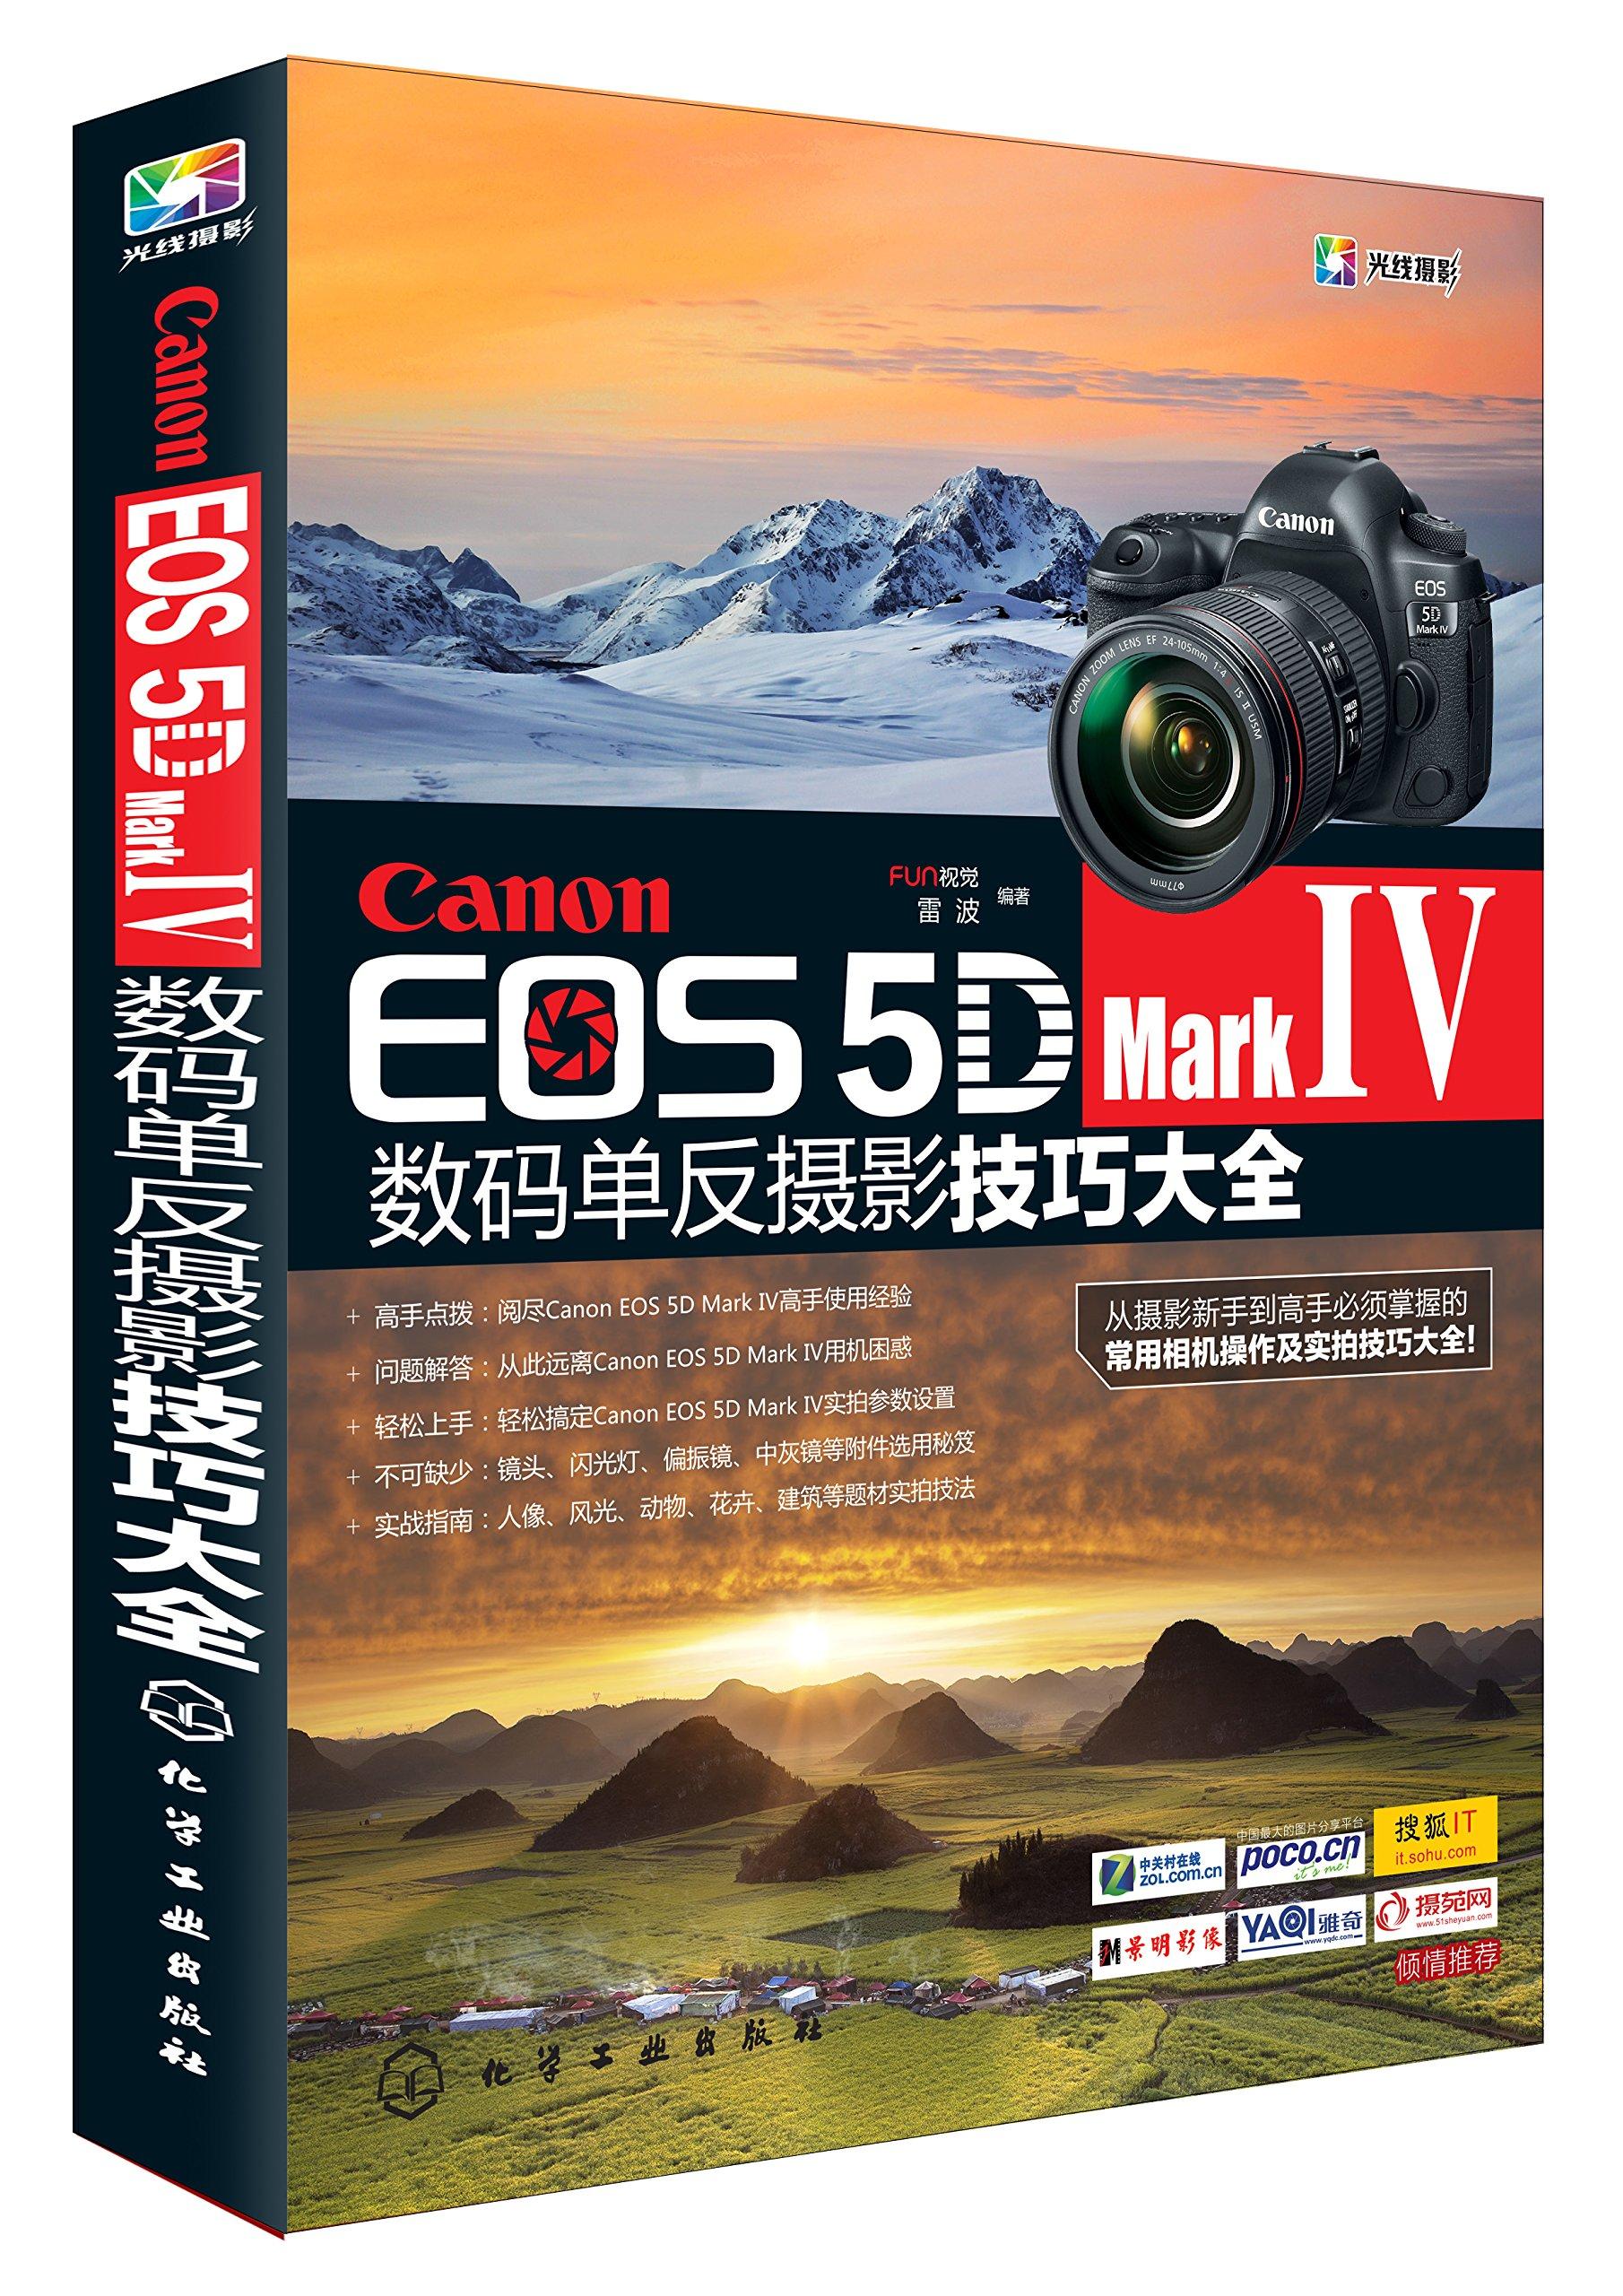 Canon EOS 5D Mark IVデジタル一眼レフ写真のヒント